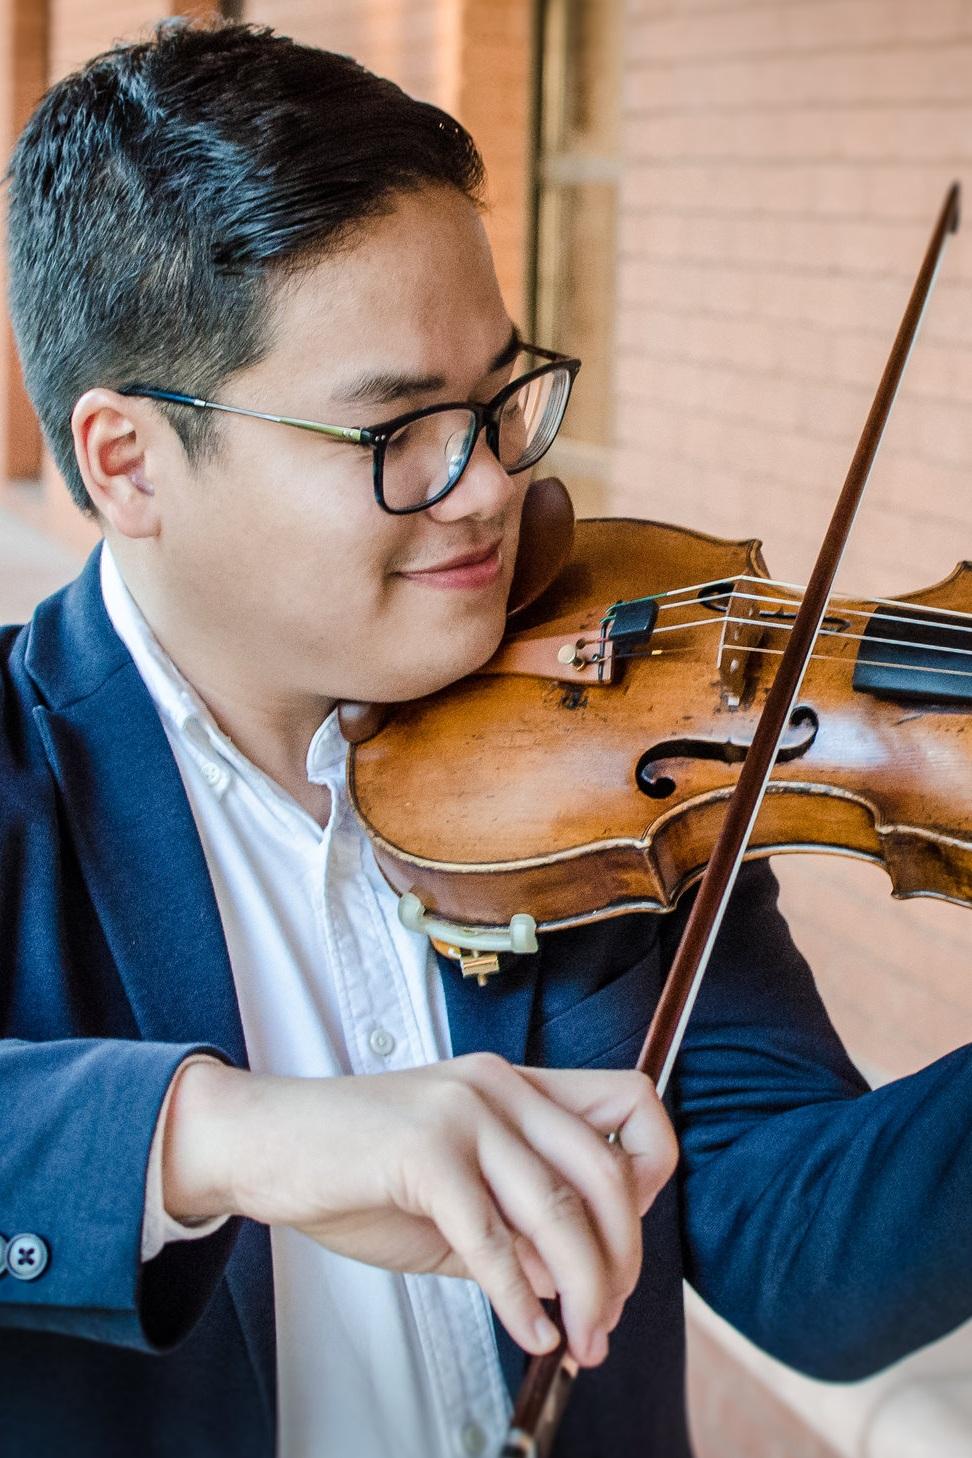 Soberano-Chino-violin.jpg